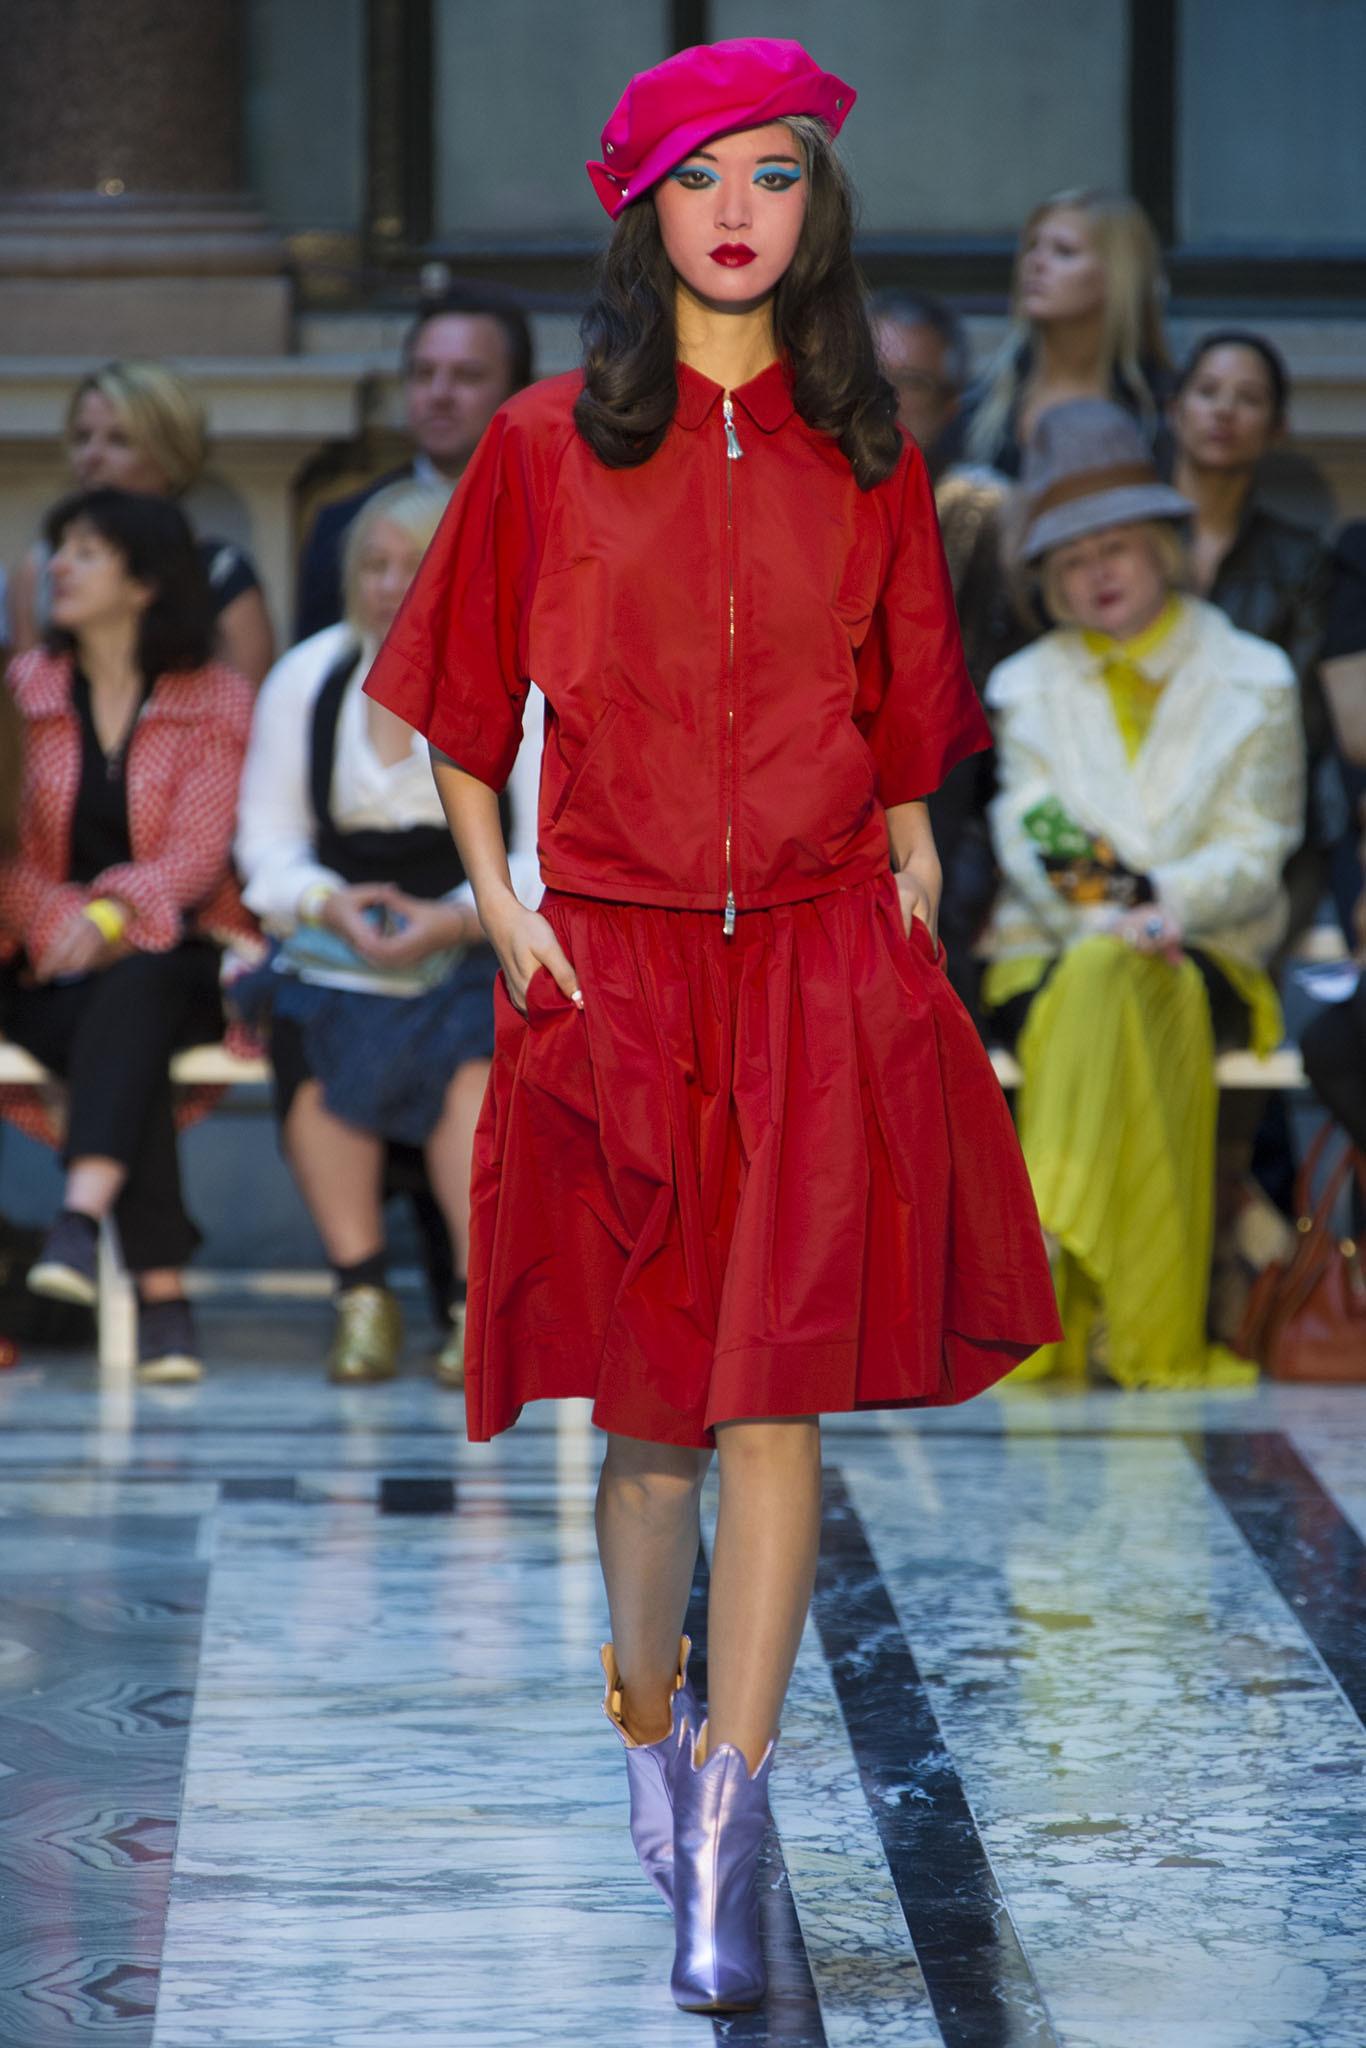 Vivienne Westwood Red Label - London Fashion Week, 2013 Spring